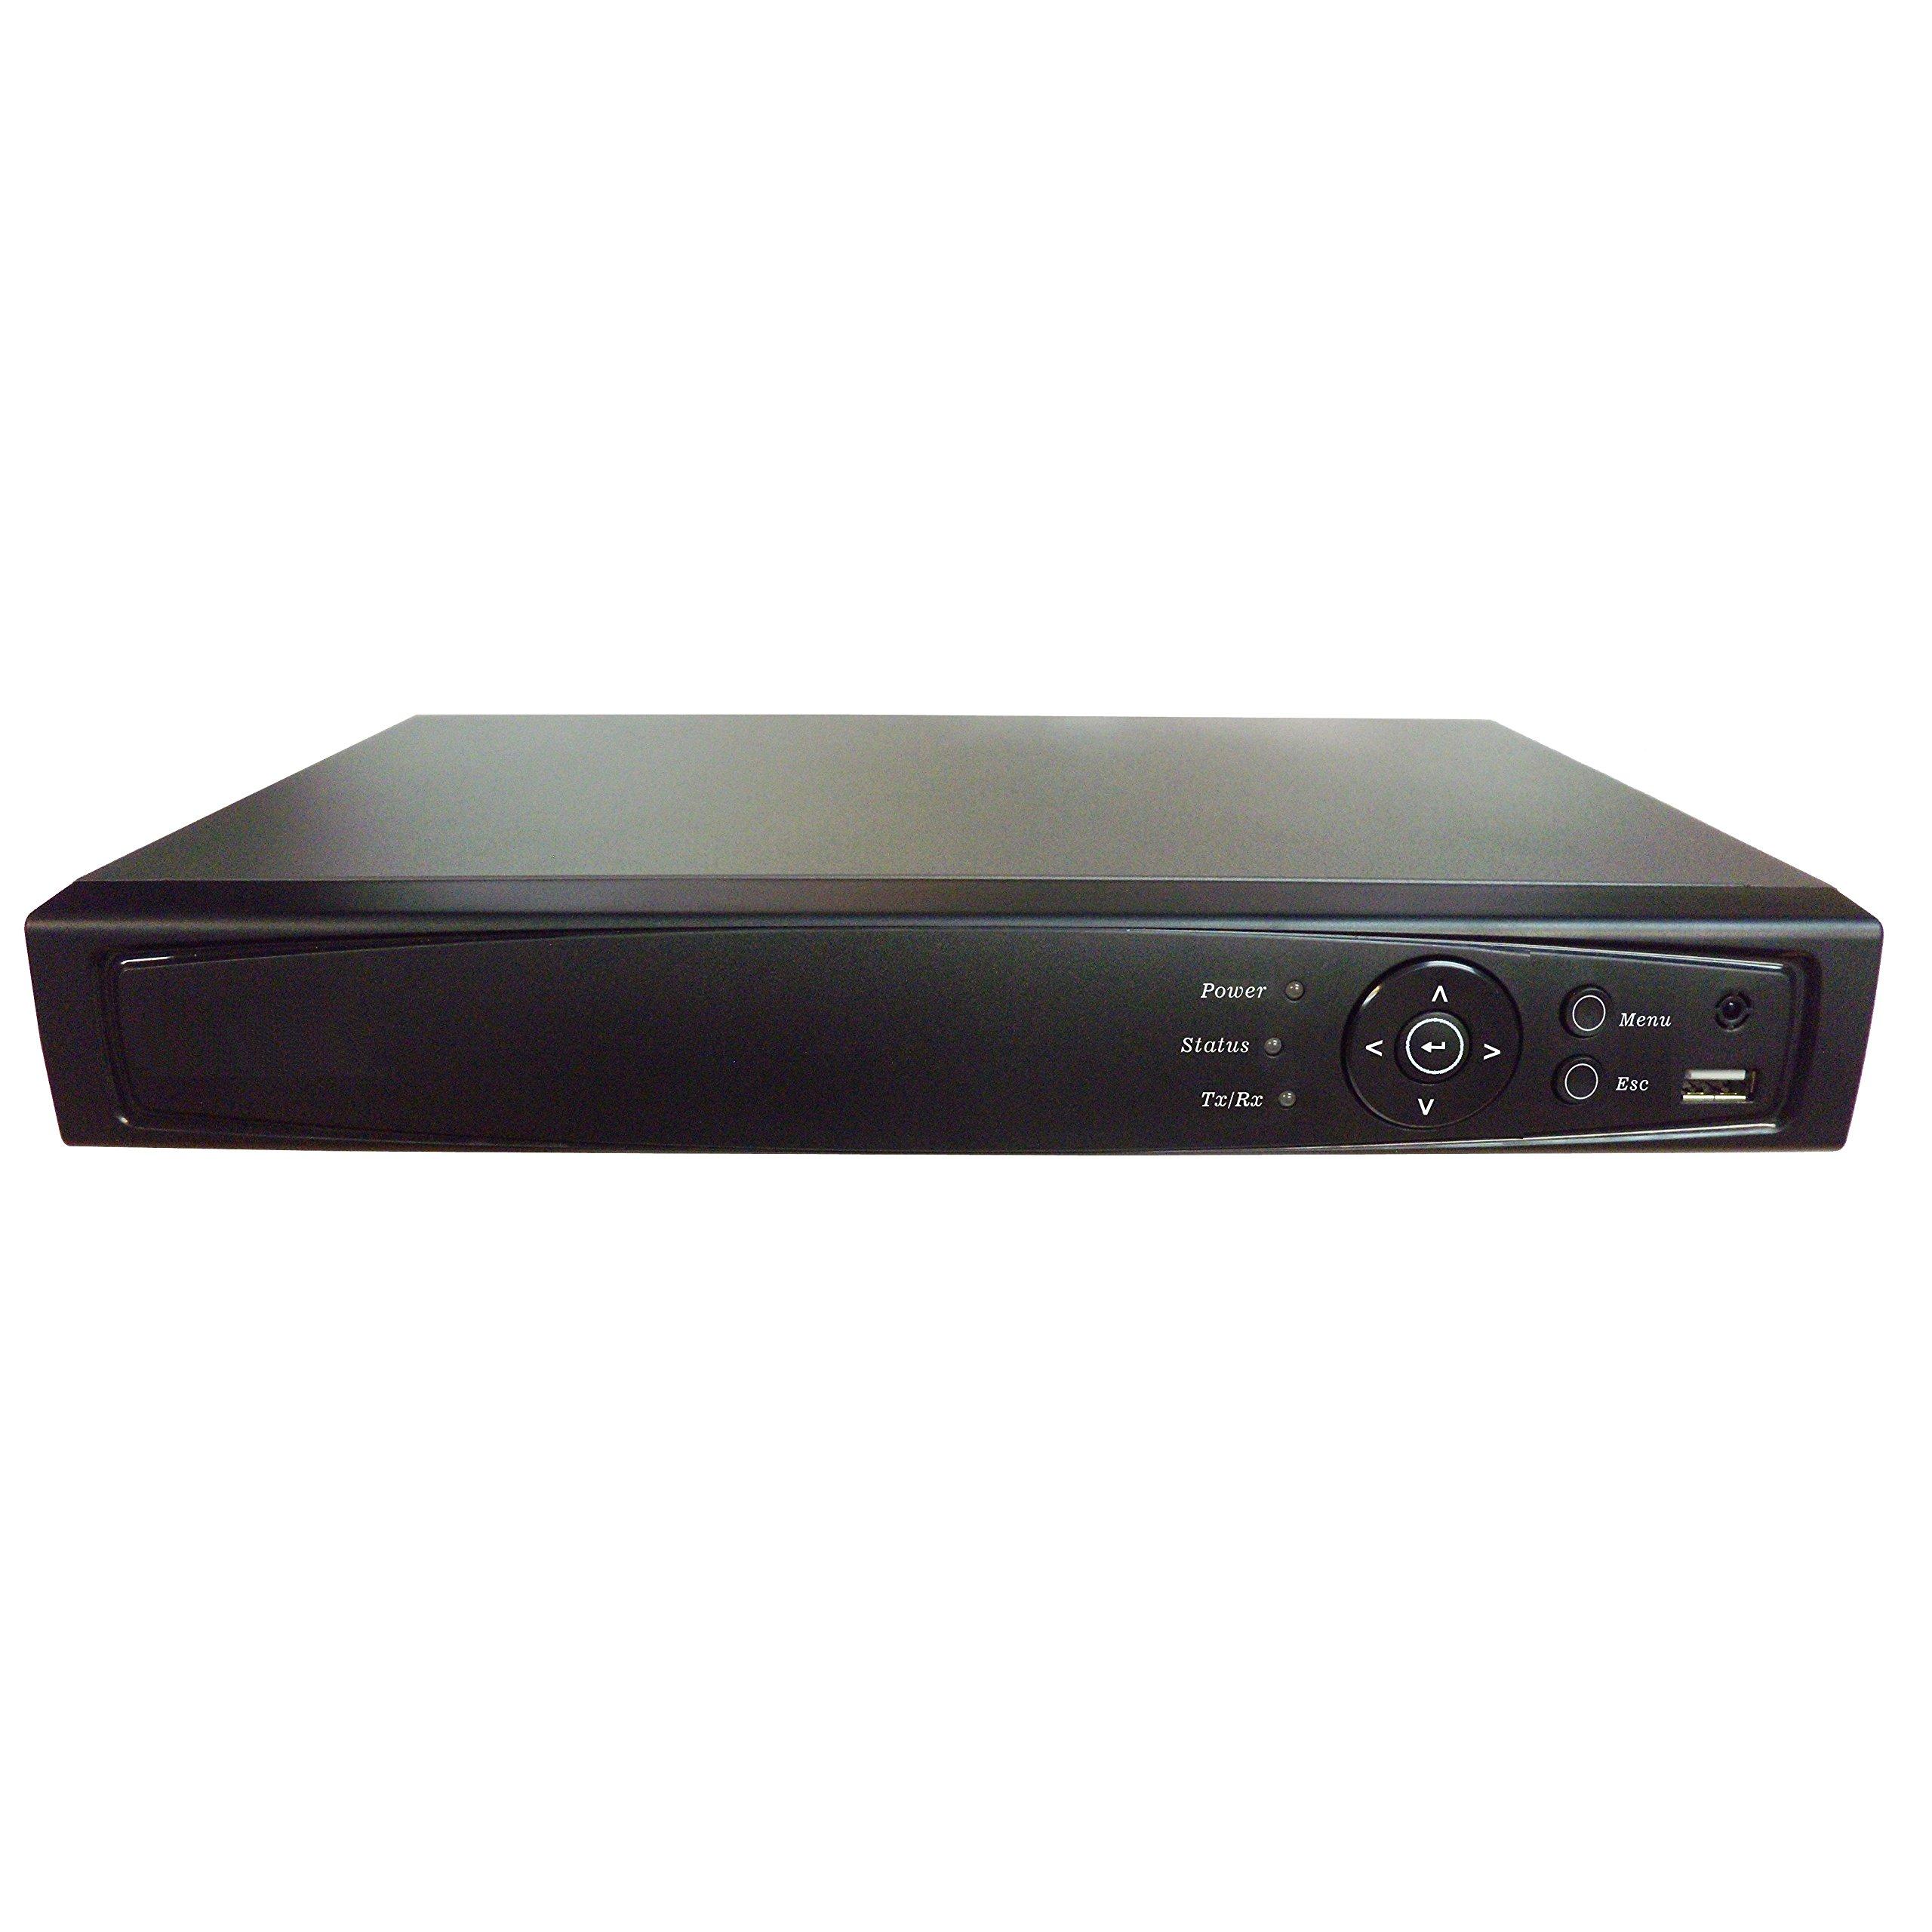 Surveillance Digital Video Recorder 8CH HD-TVI/CVI/AHD H264 Full-HD DVR 1TB HDD HDMI/VGA/BNC Video Output Cell Phone APPs for Home & Office Work @1080P/720P TVI&CVI, 1080P AHD, Standard Analog& IP Cam by 101 AV Inc (Image #2)